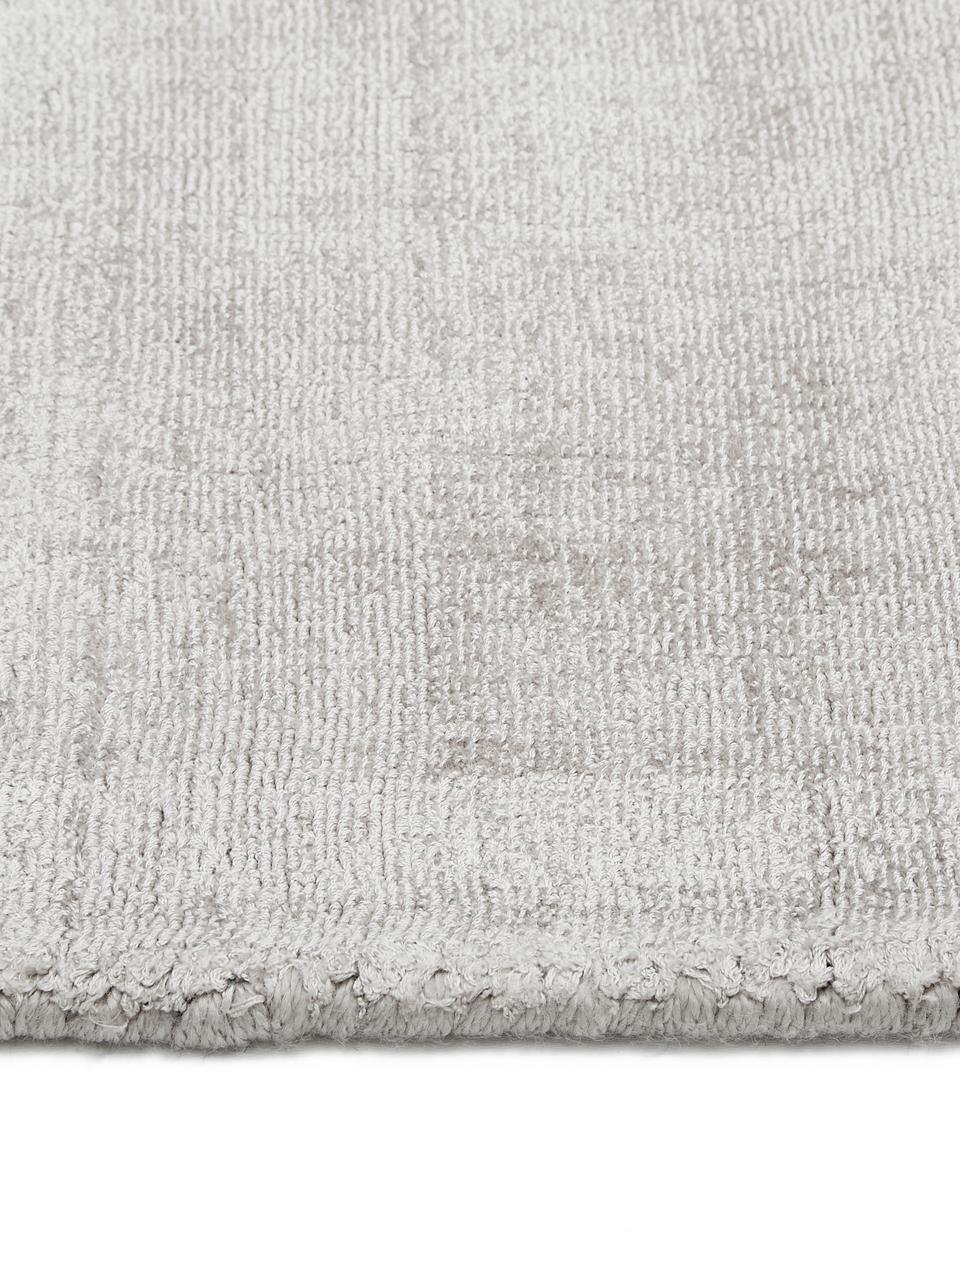 Handgewebter Viskoseläufer Jane in Hellgrau-Beige, Flor: 100% Viskose, Hellgrau-Beige, 80 x 250 cm